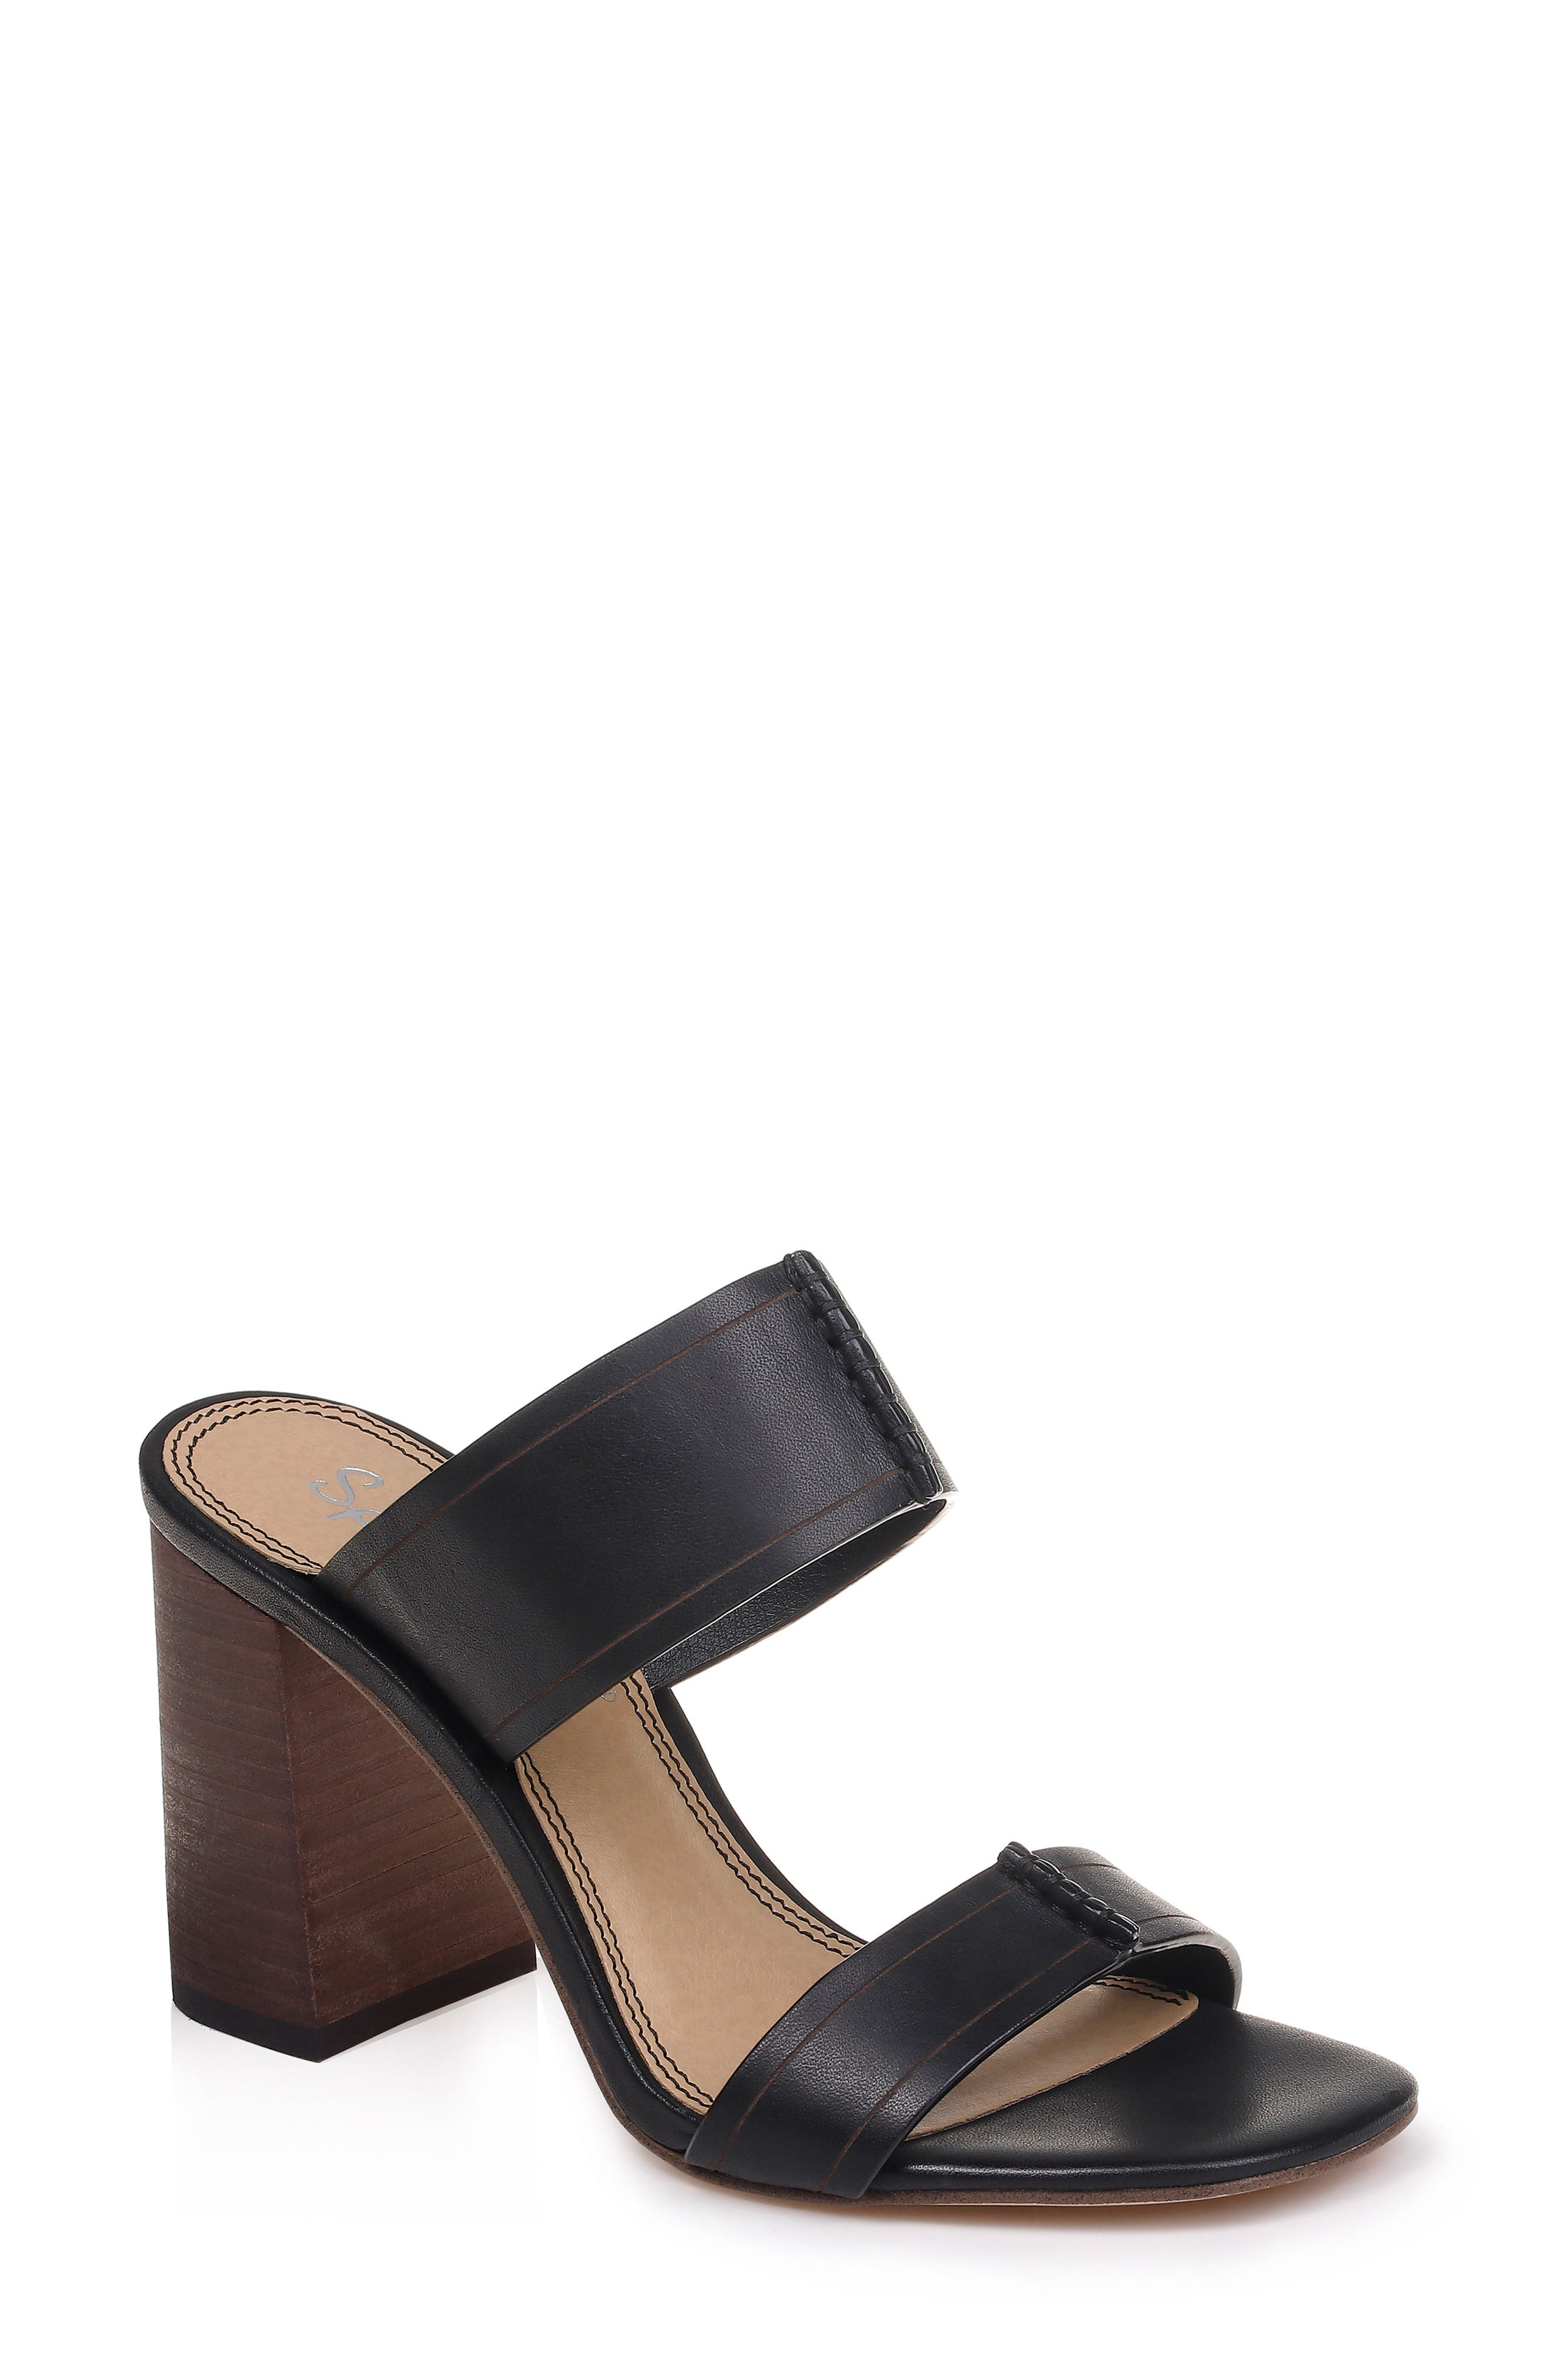 SPLENDID Tacy Slide Sandal, Main, color, BLACK LEATHER